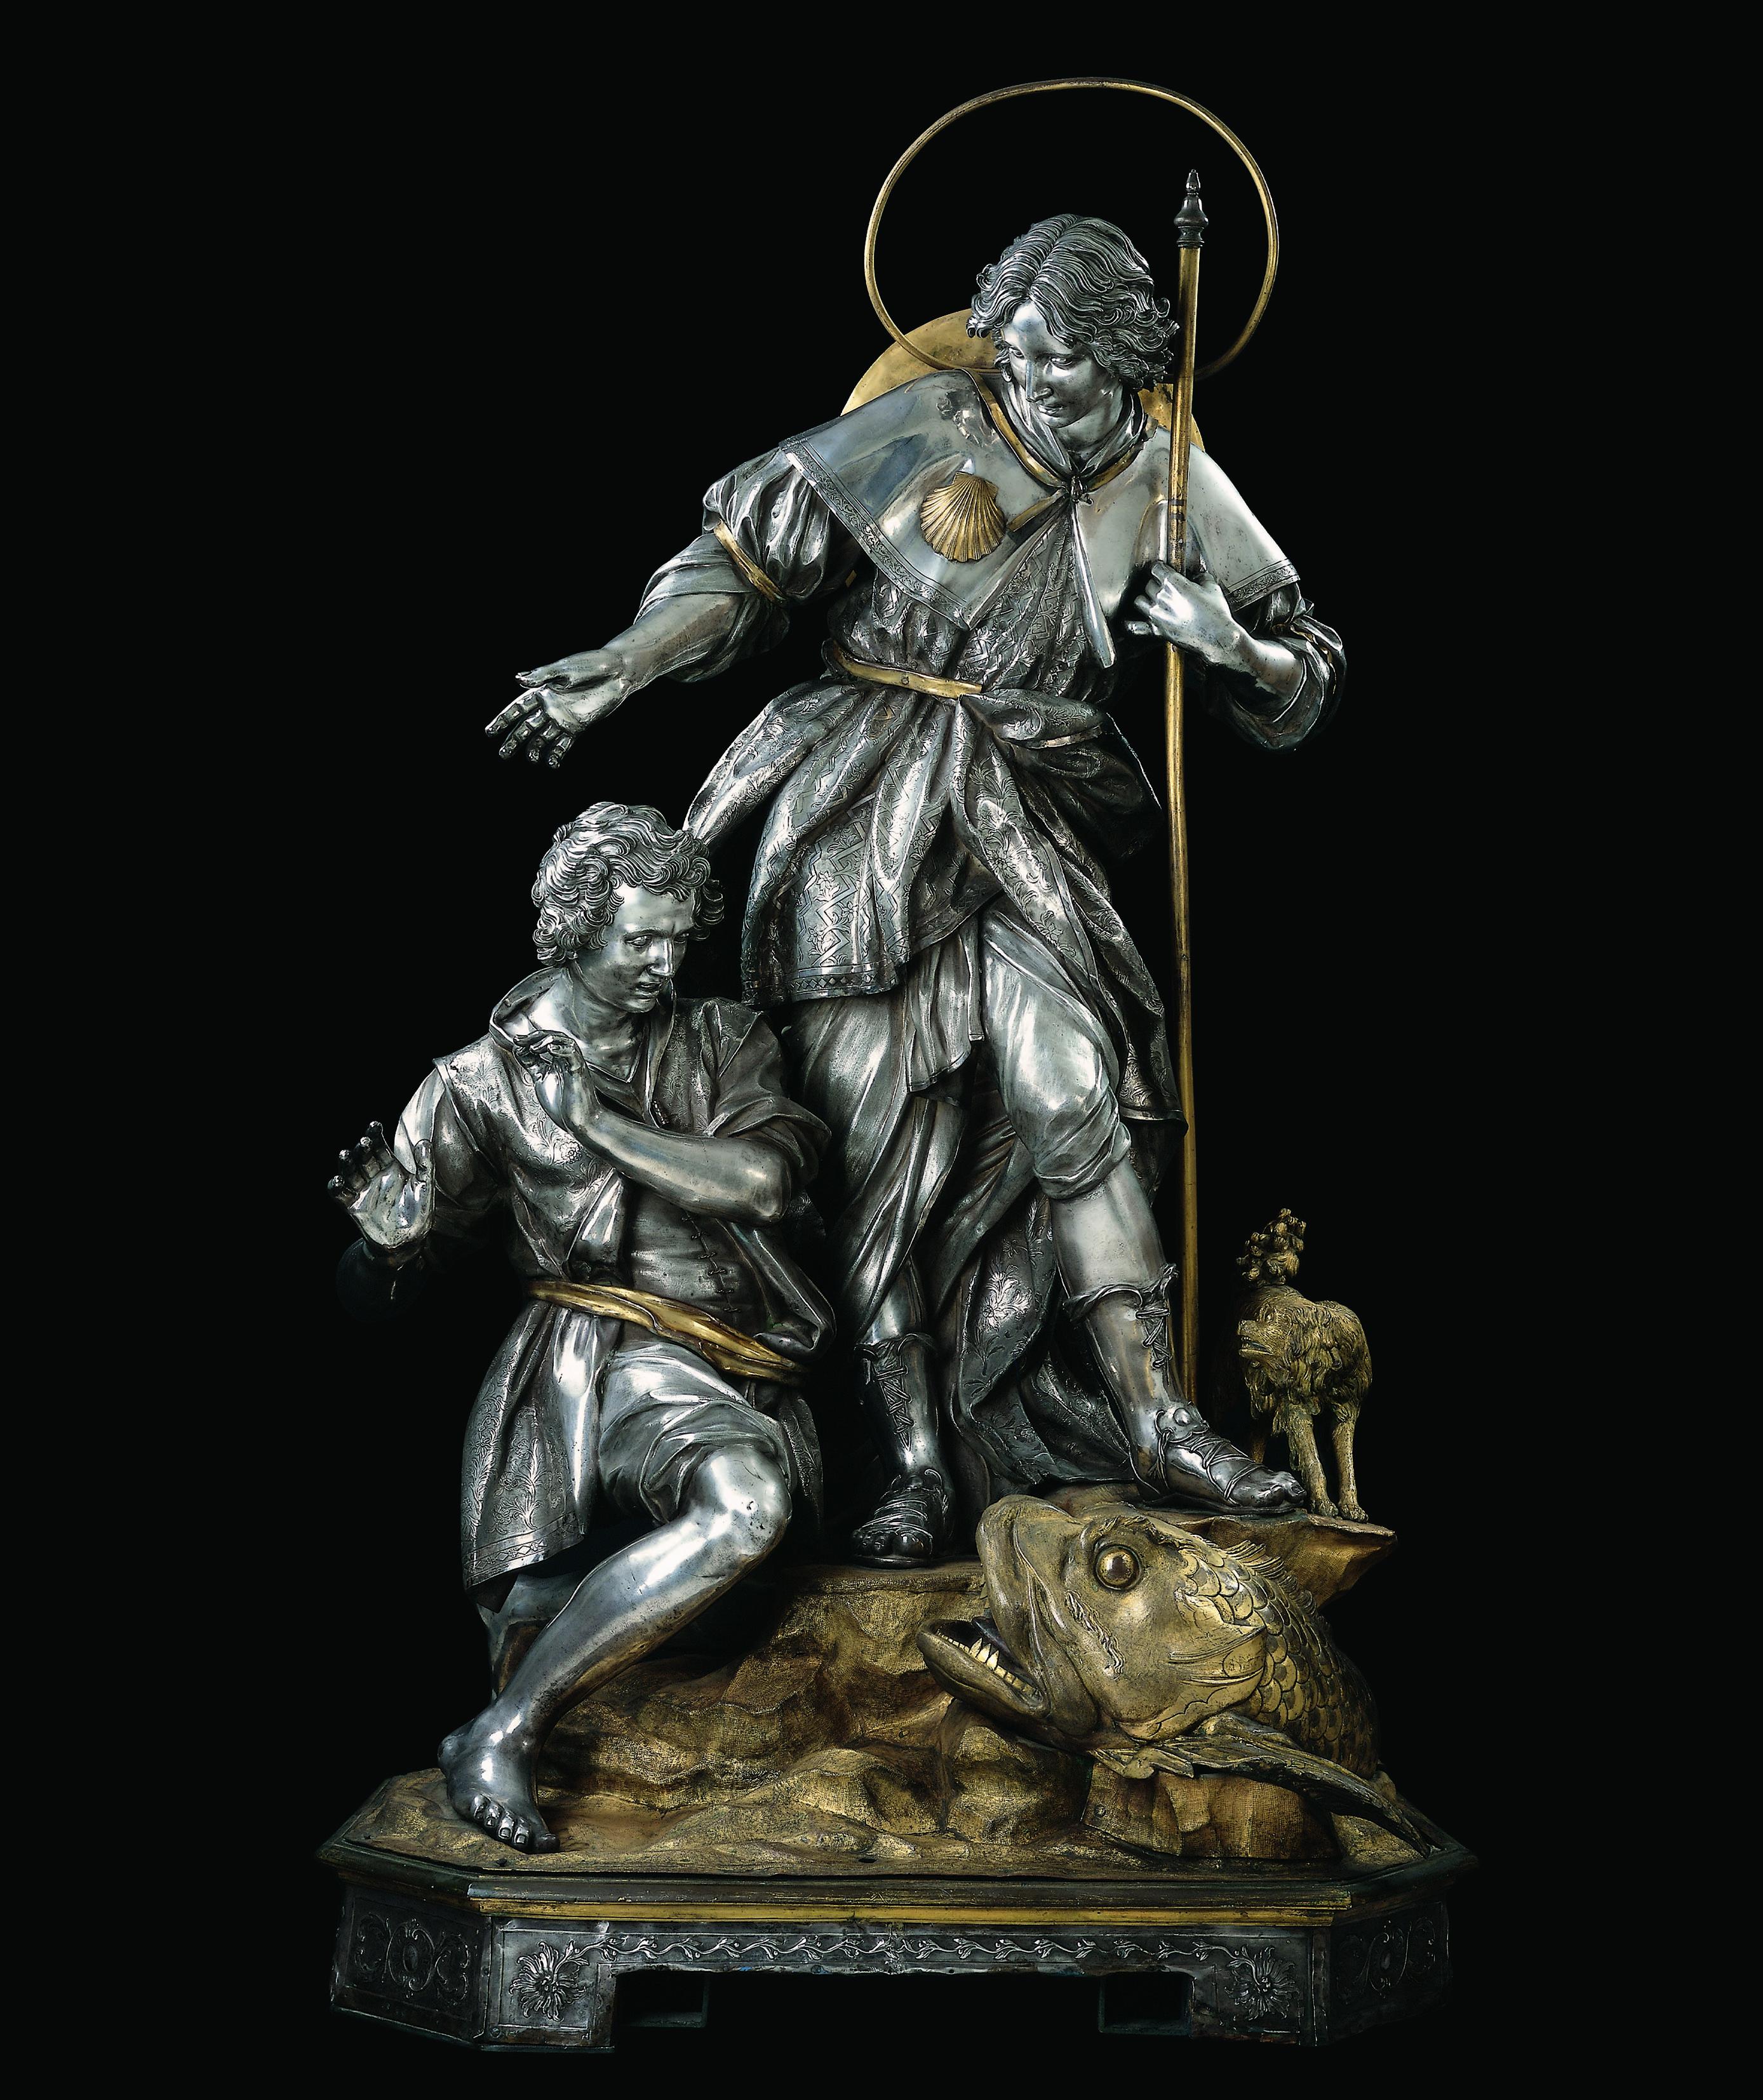 Giuseppe-Del-Giudice-Tobiolo-e-lAngelo-detto-San-Rafaele-1797-argento-fuso-sbalzato-cesellato-rame-bronzo-dorato